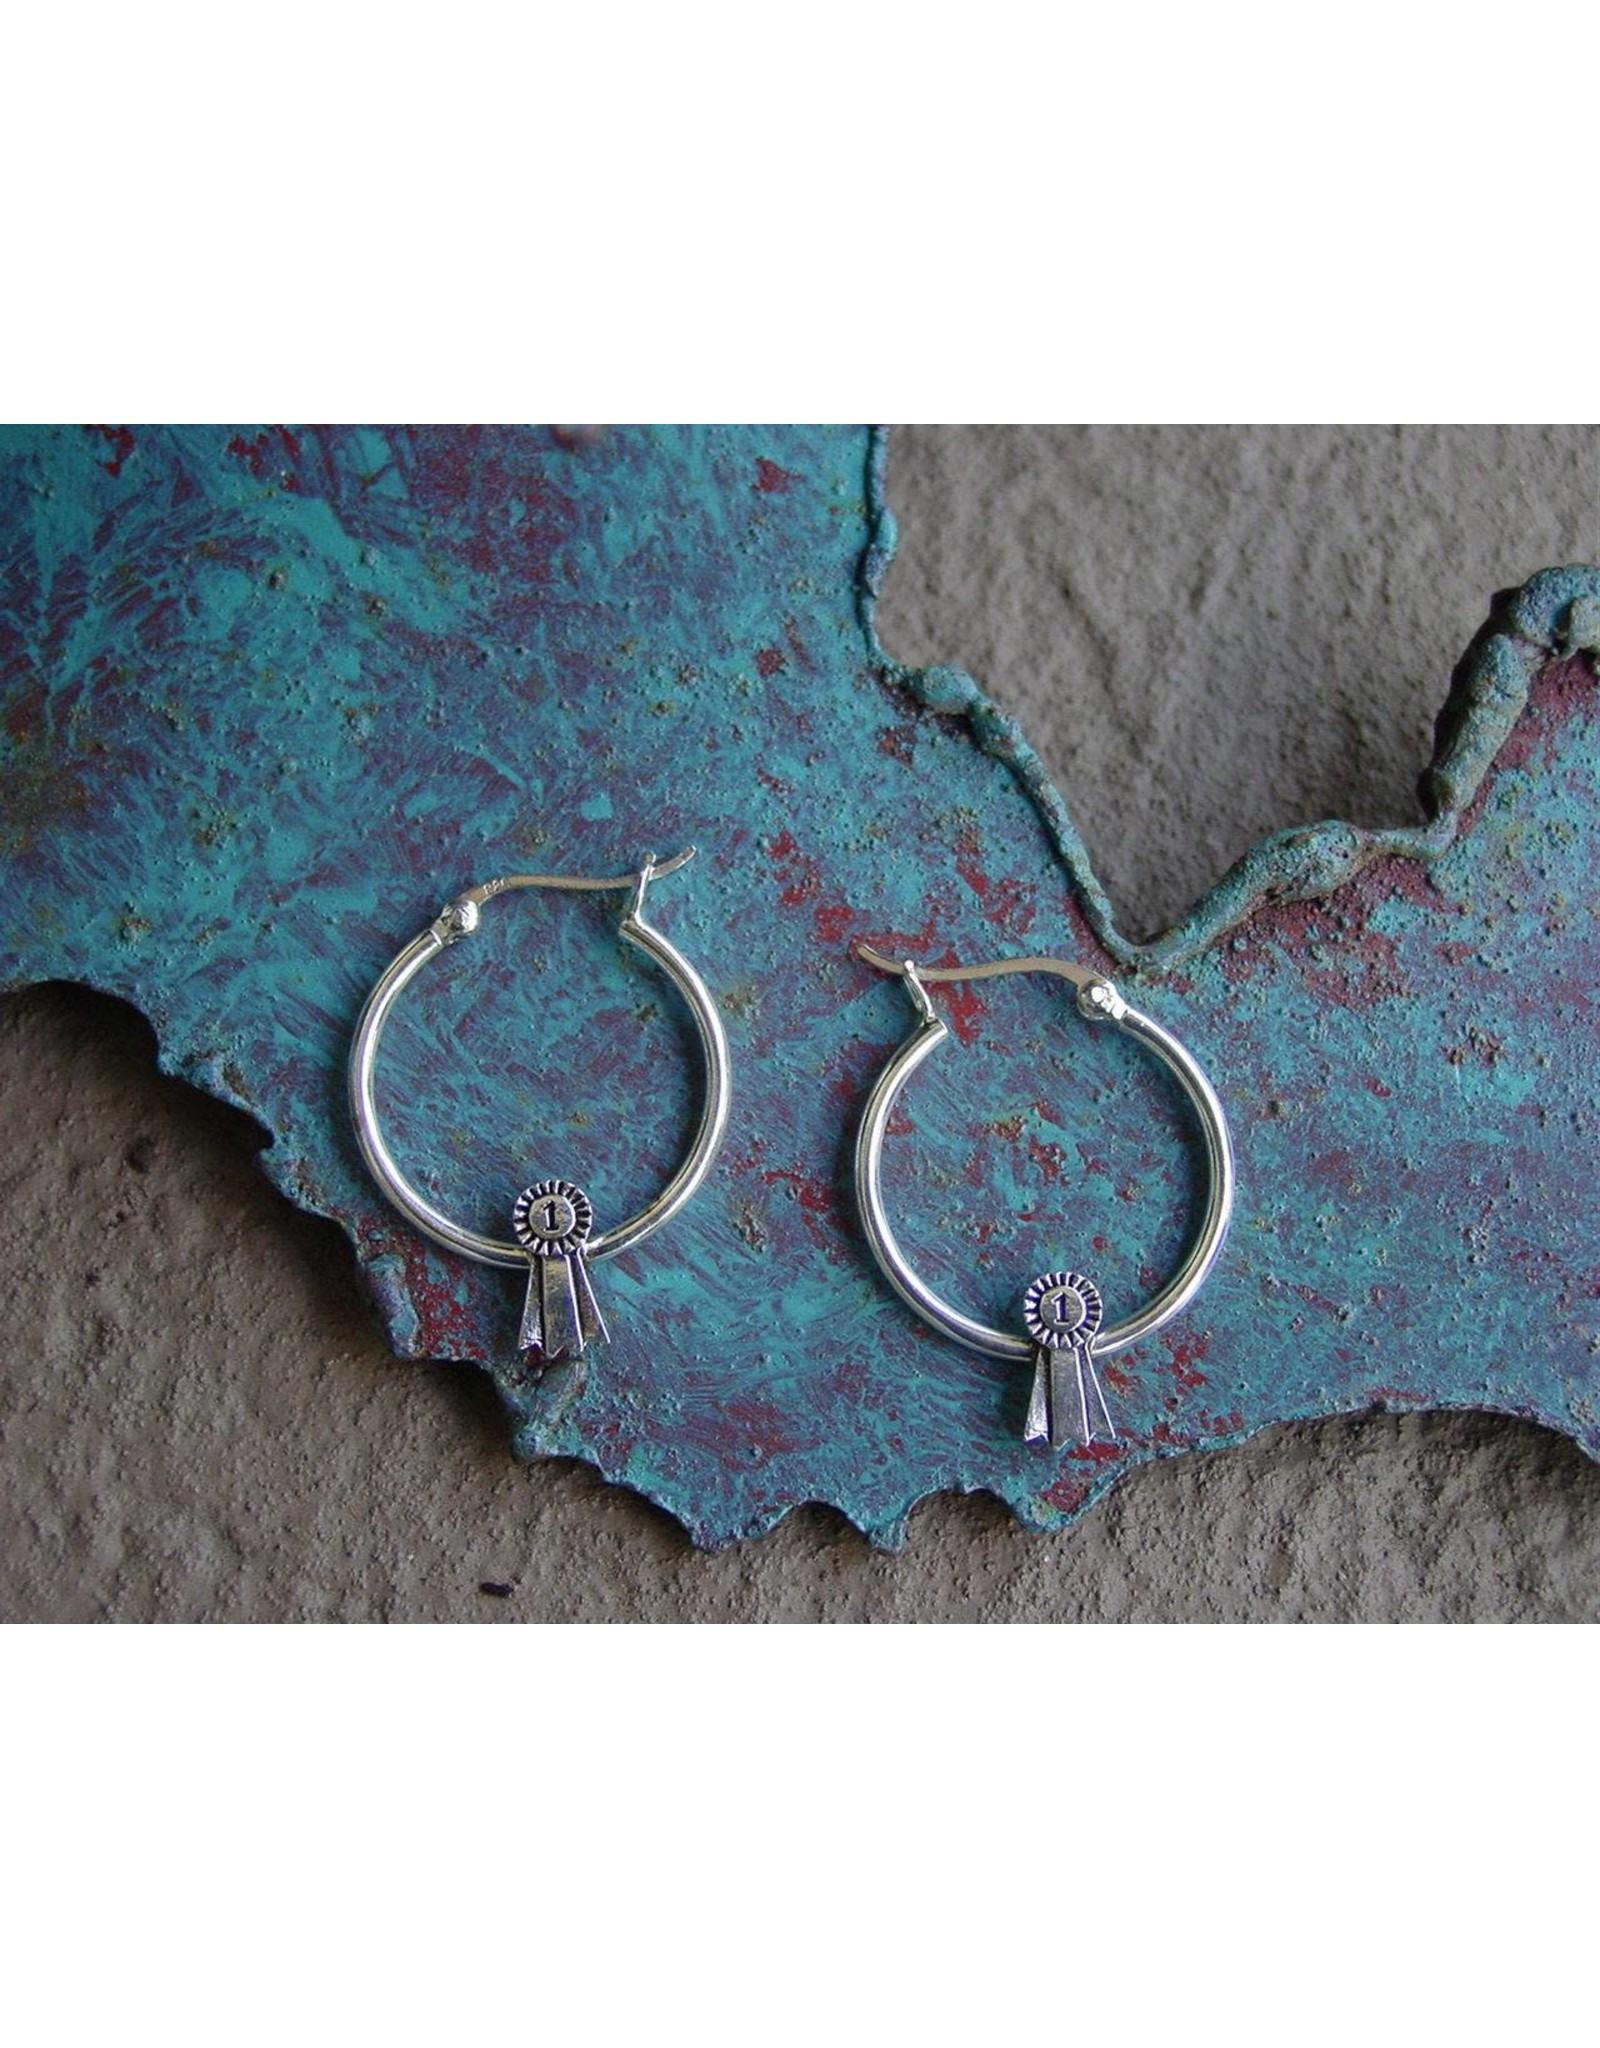 Baron Equestrian Earrings Sterling Ribbon Hoops E309